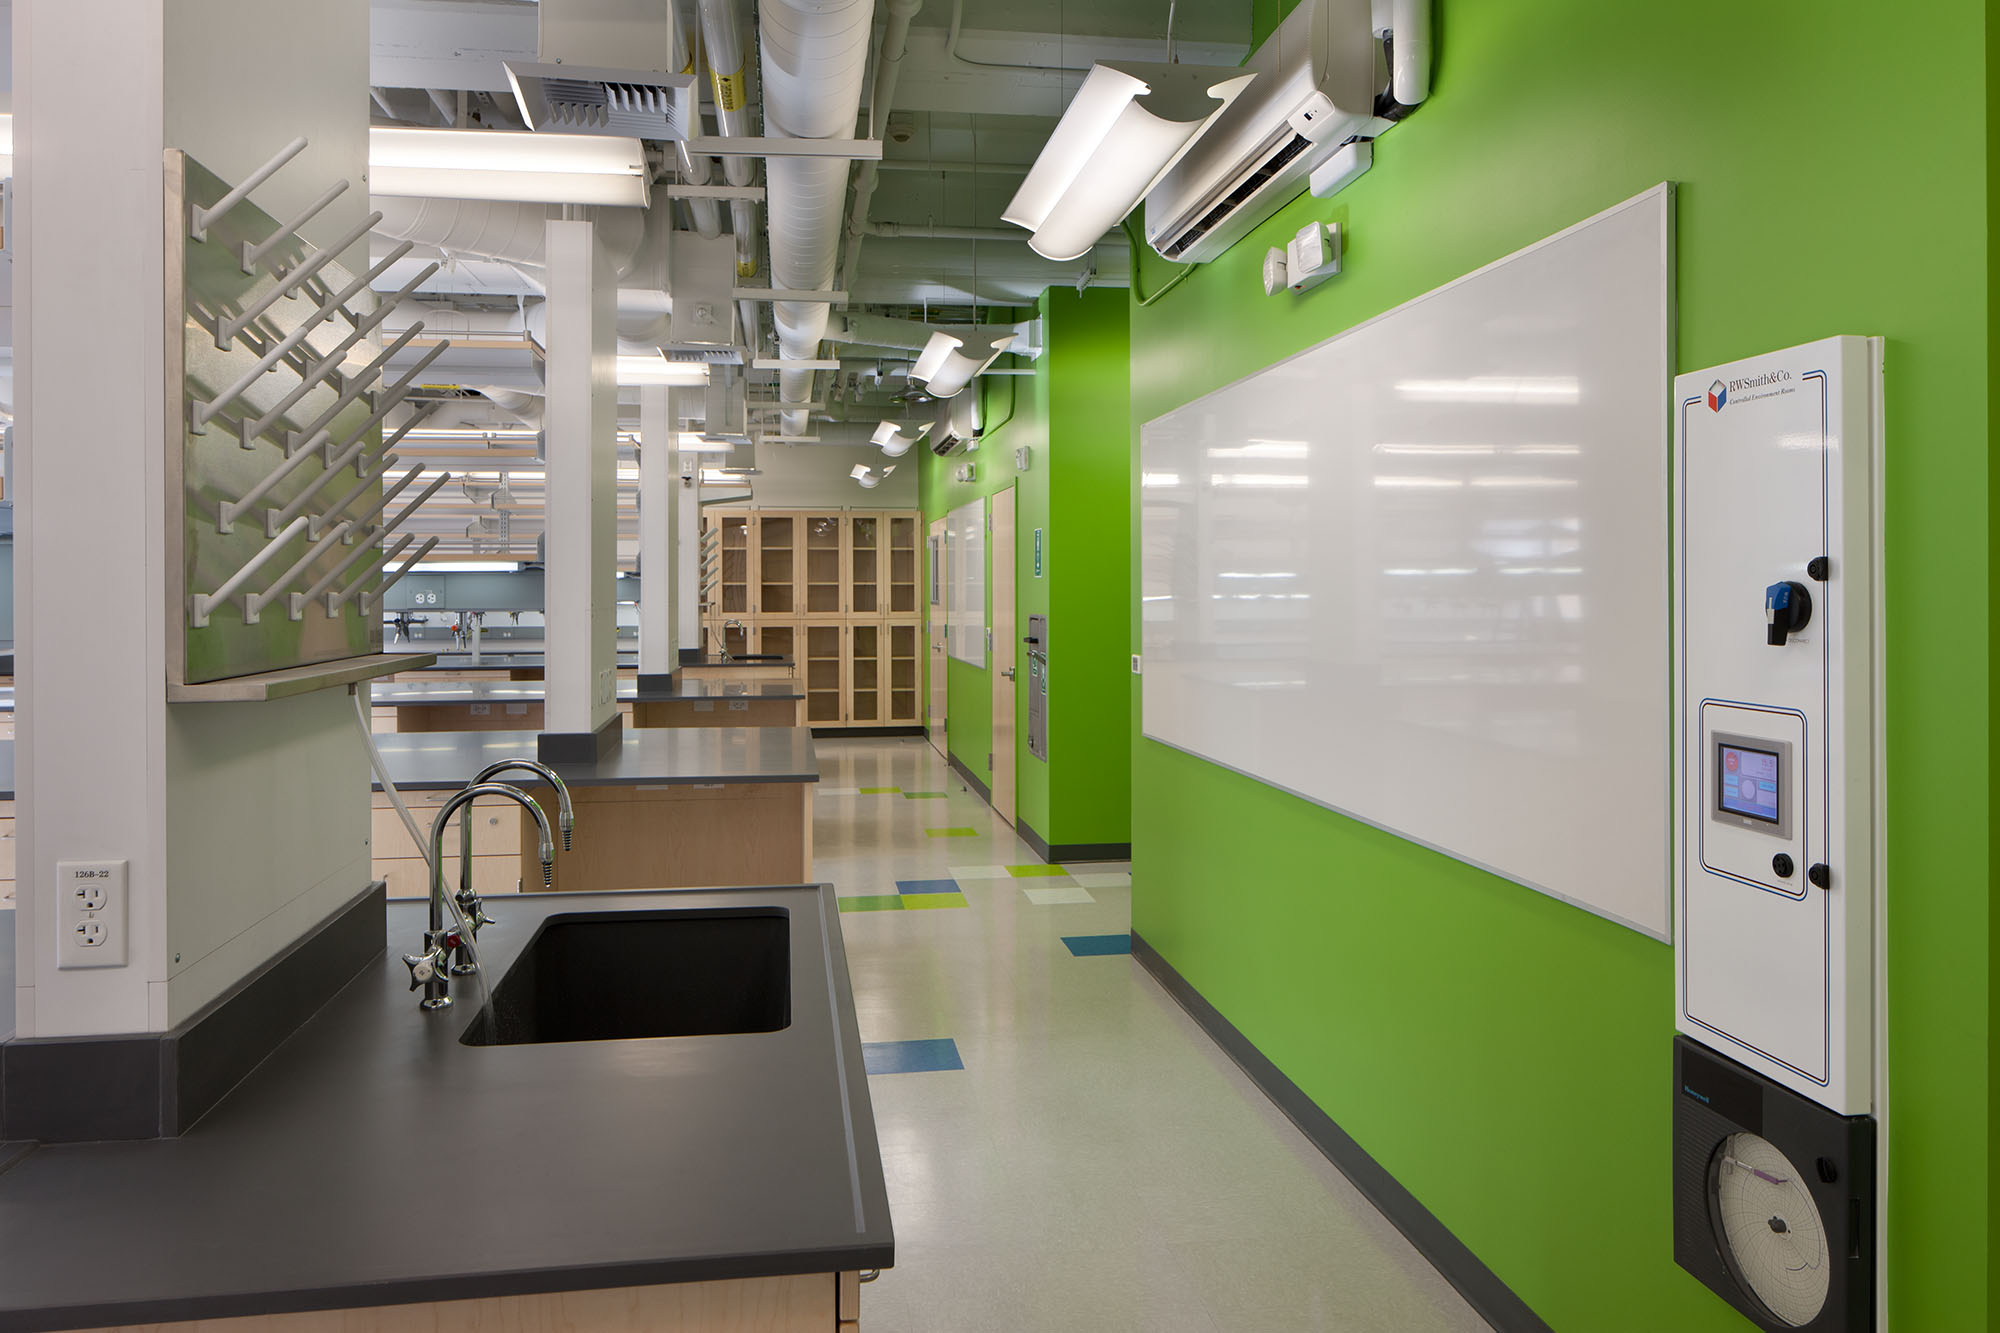 Laboratories_PPC_0007s_0002_Shapiro Lab copy.jpg